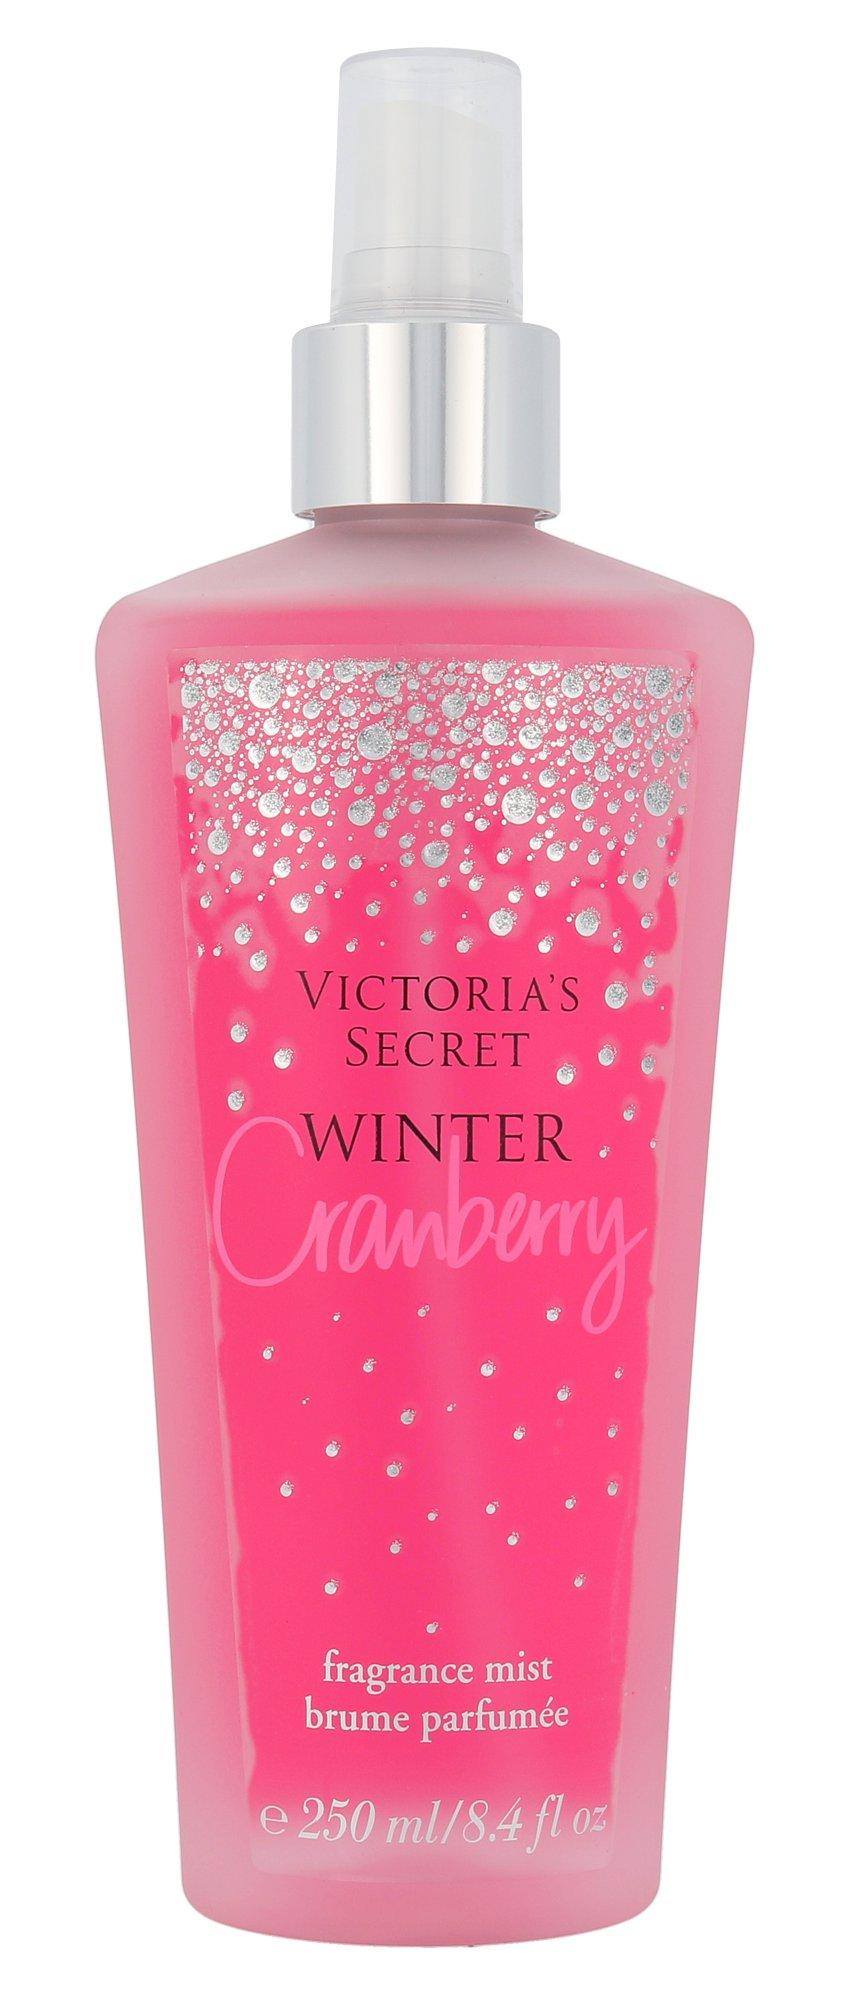 Victoria´s Secret Winter Cranberry, Telový závoj 250ml